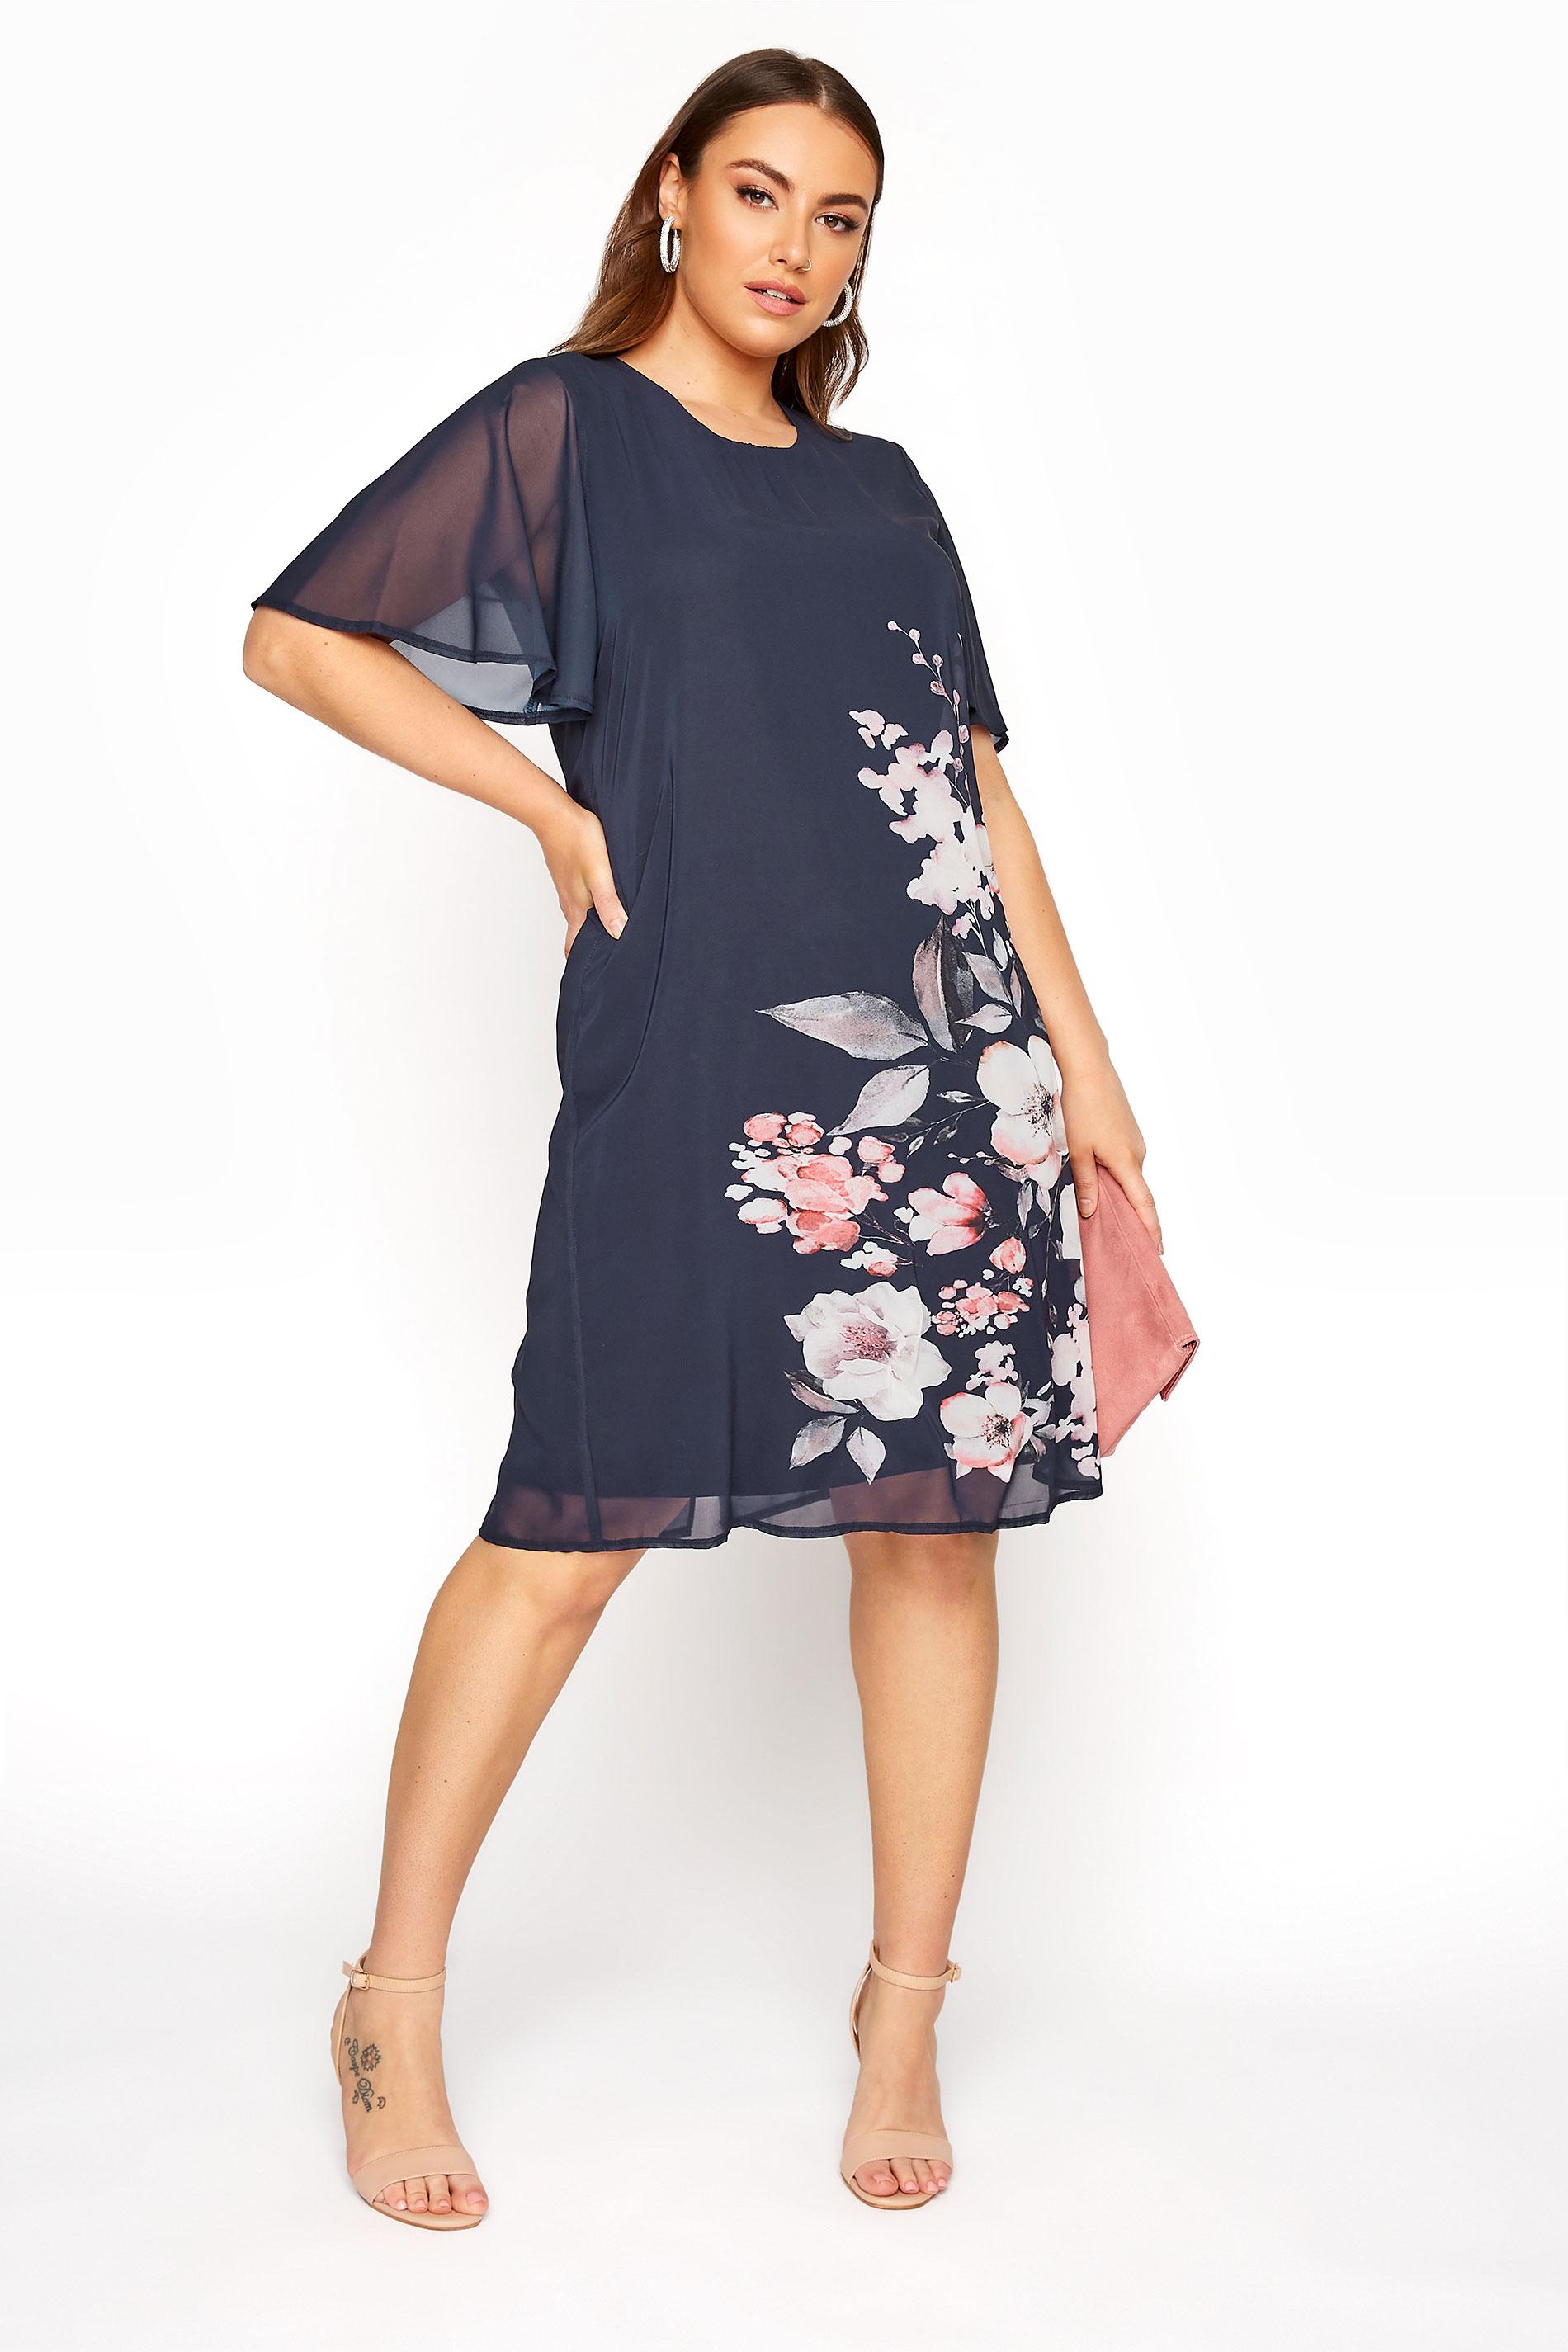 Navy Short Angel Sleeve Floral Dress